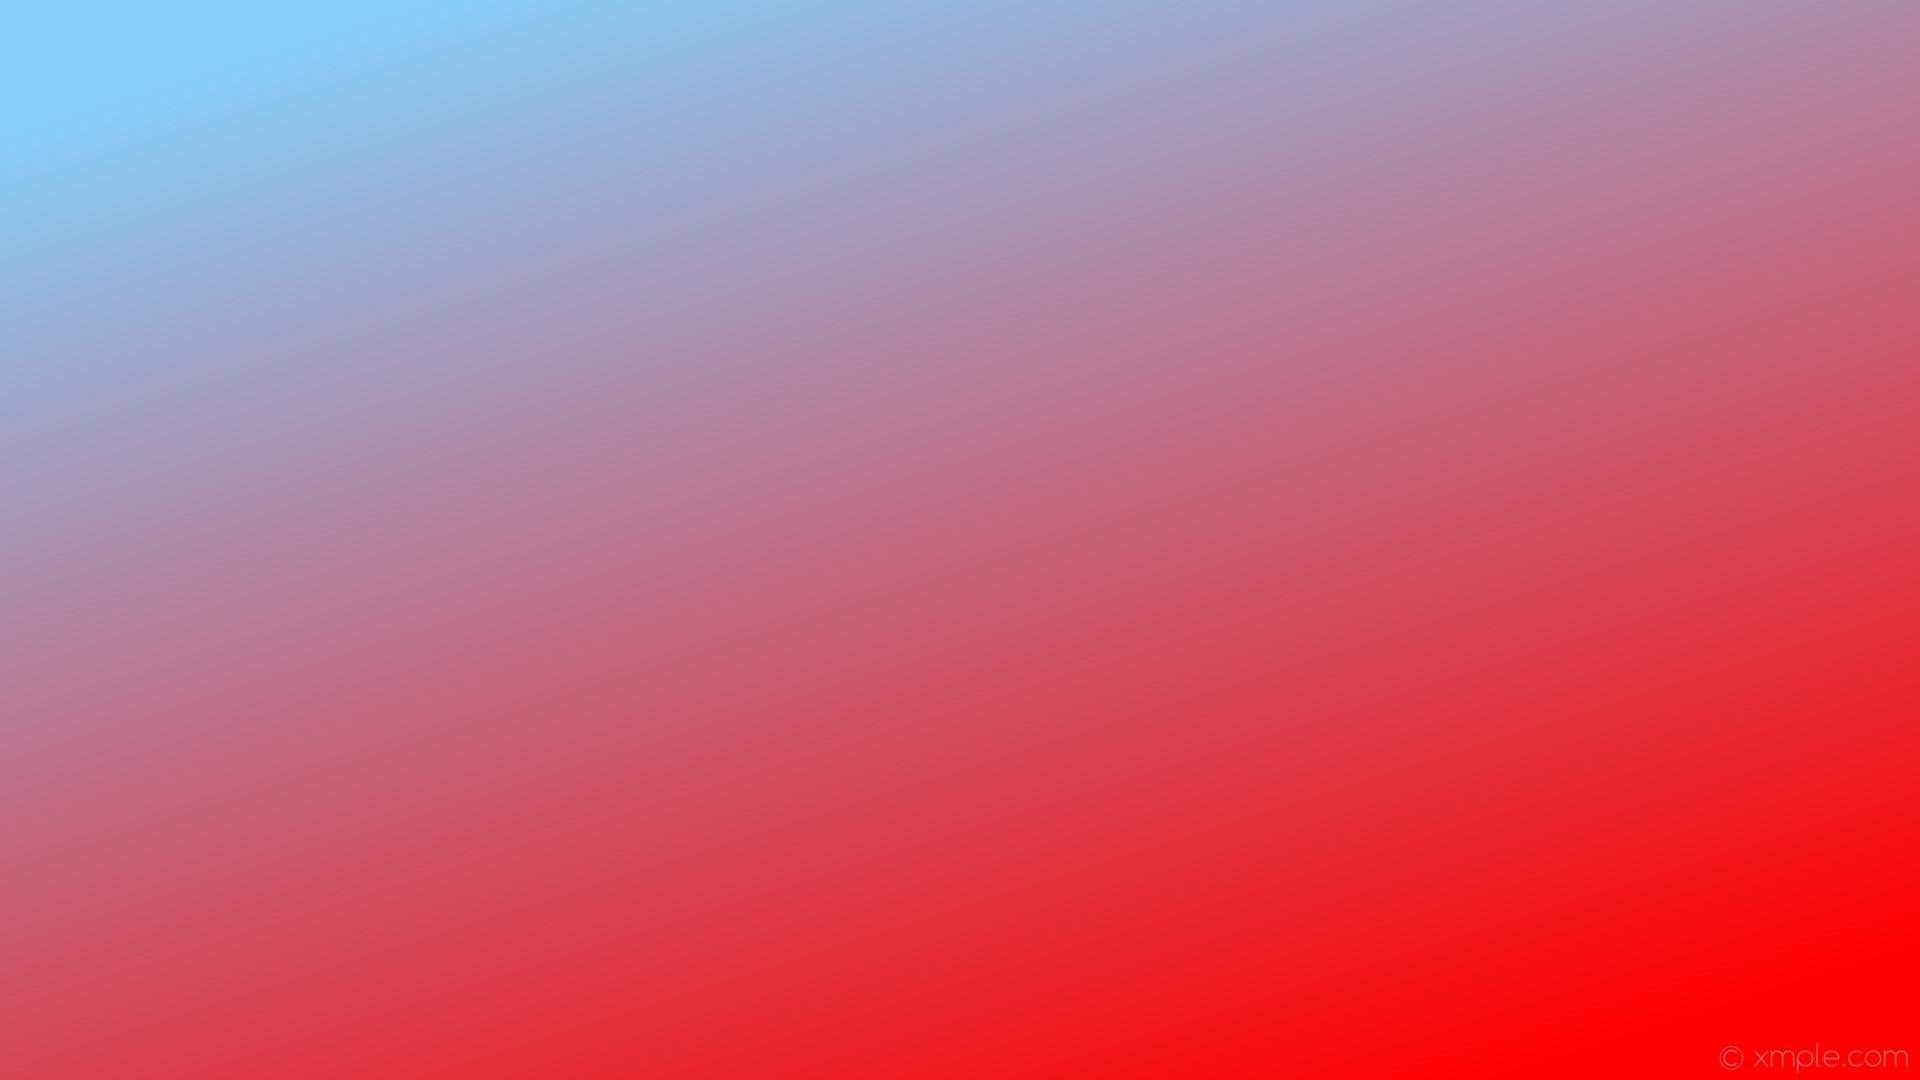 wallpaper gradient linear red blue light sky blue #ff0000 #87cefa 315°